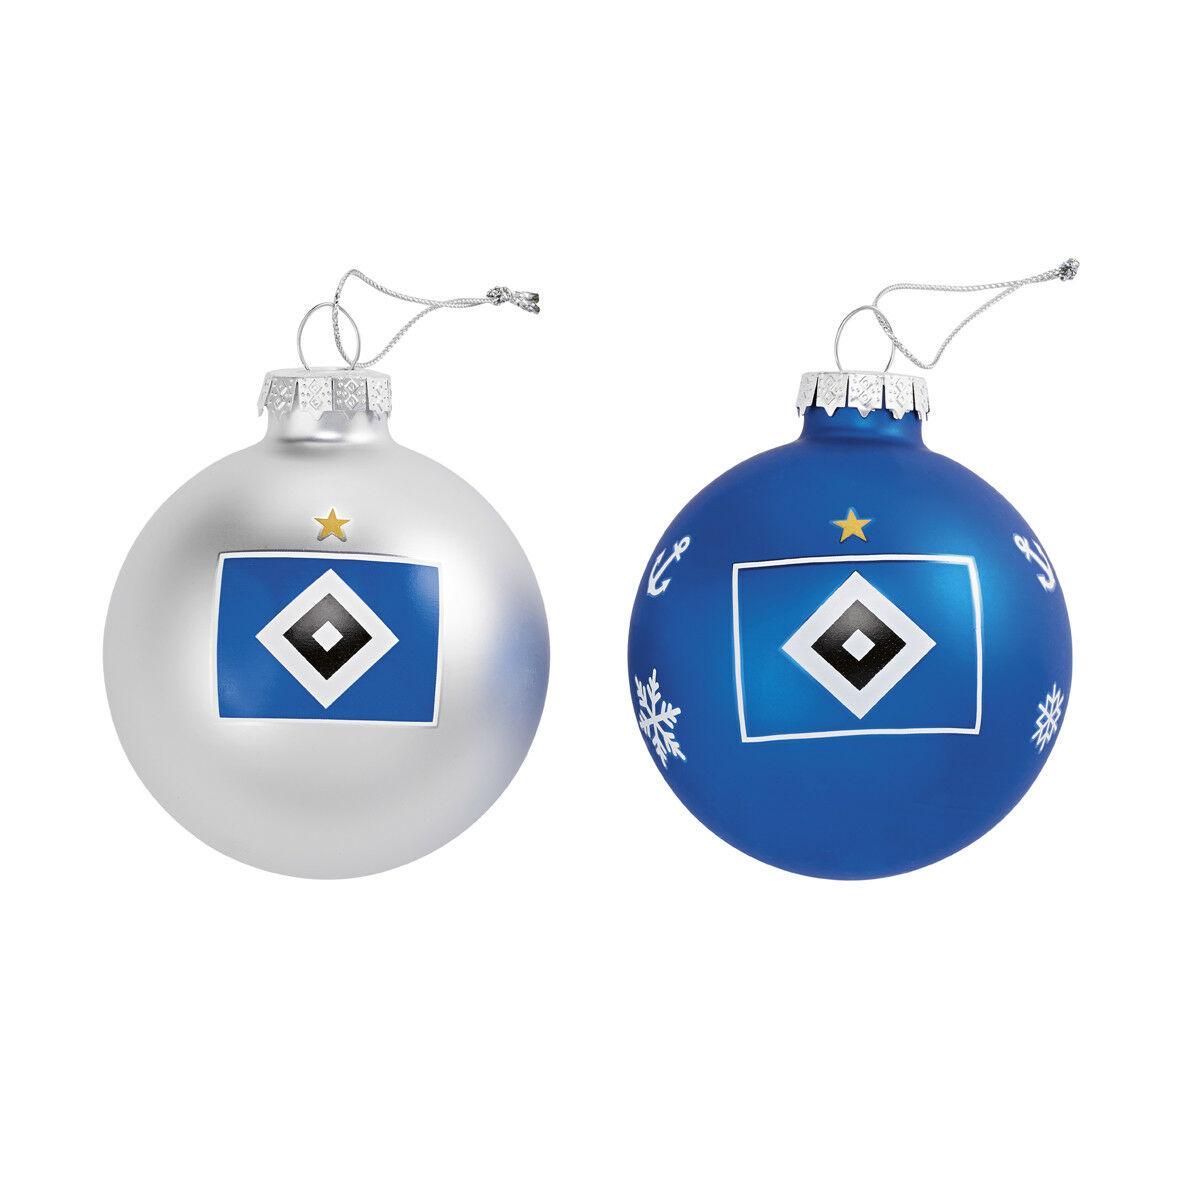 Hsv Weihnachtskugeln.Sport Christbaumkugeln 4er Set Hsv Hamburger Sportverein